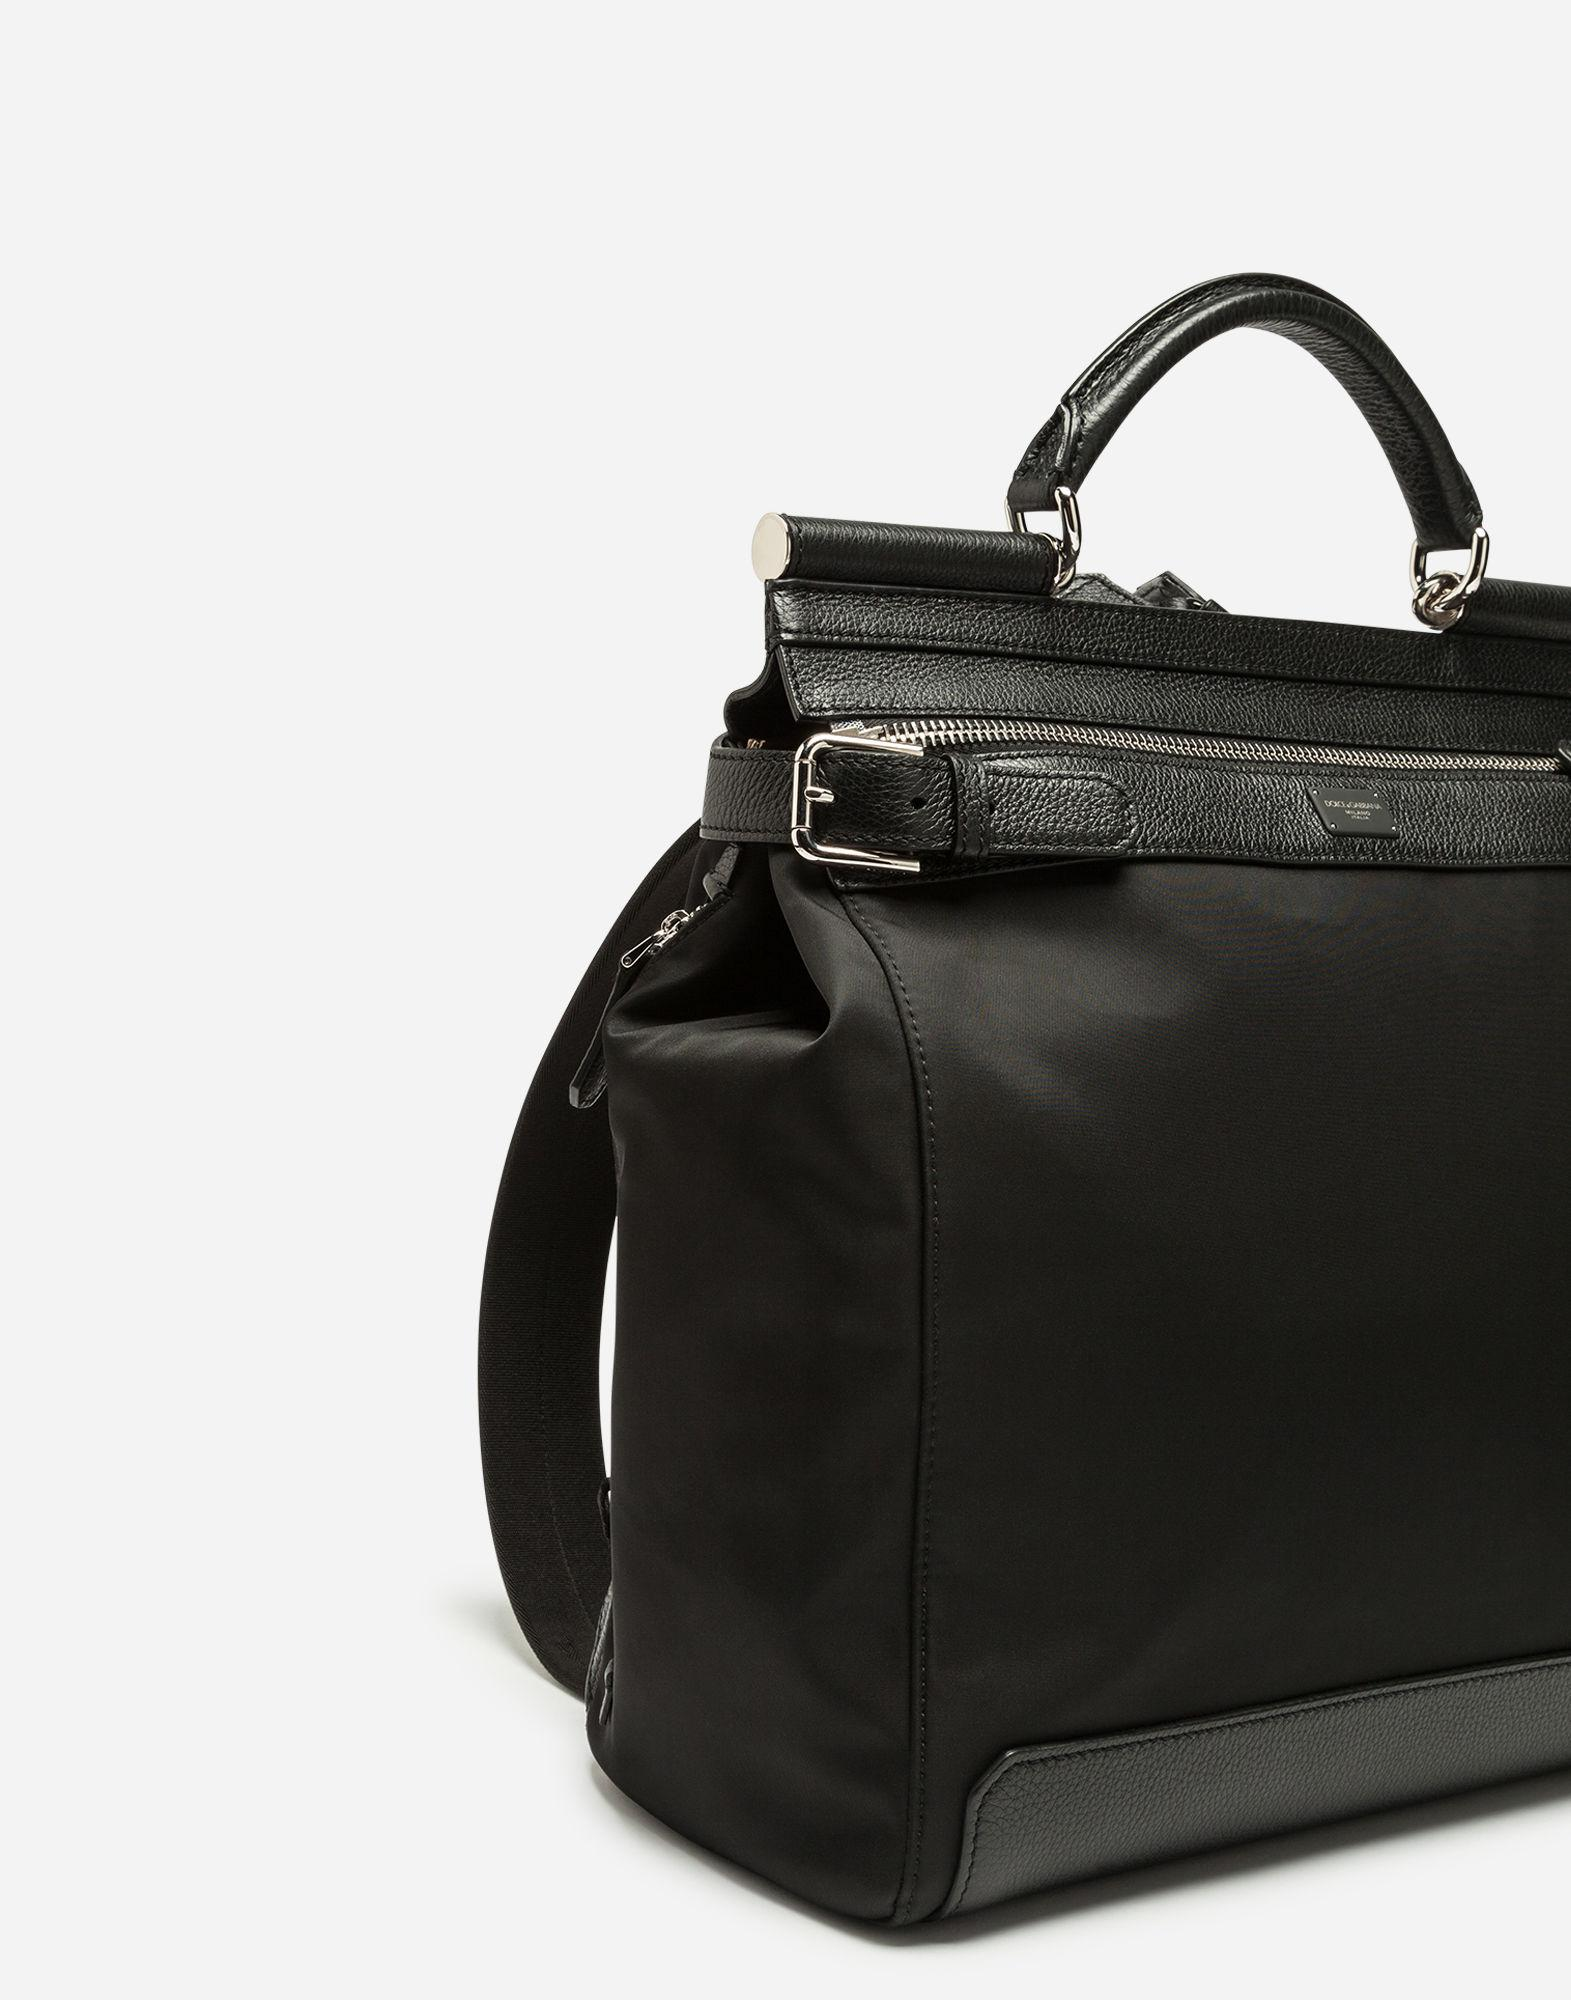 Lyst - Dolce   Gabbana Sicily Backpack In Nylon in Black for Men 5160db9e53